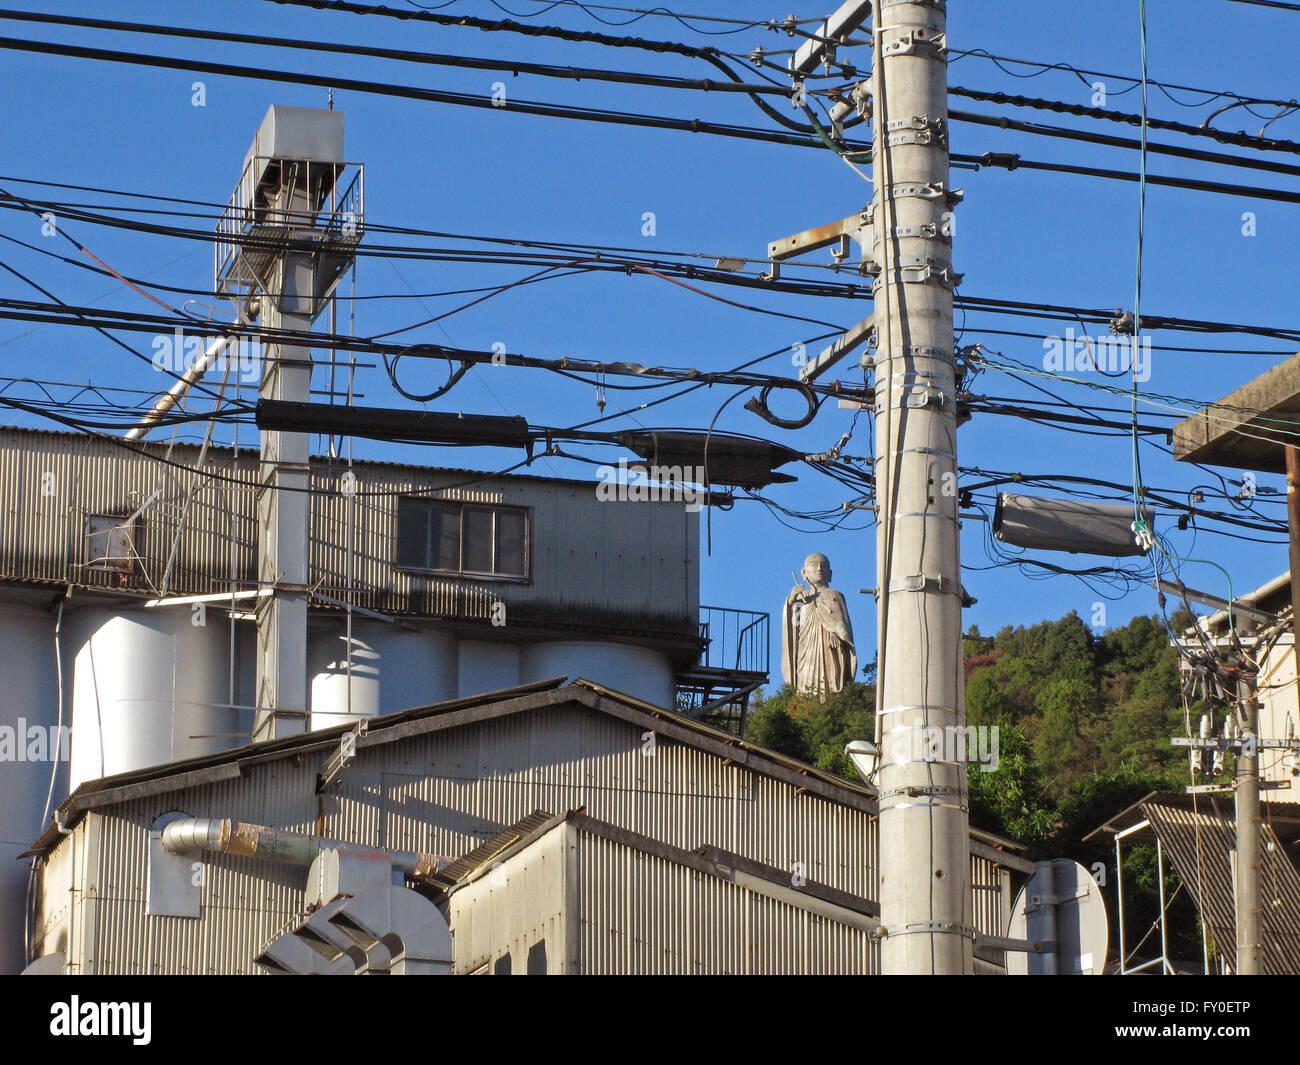 Buddah on hilltop through industrial powerlines Matsuyama Japan - Stock Image